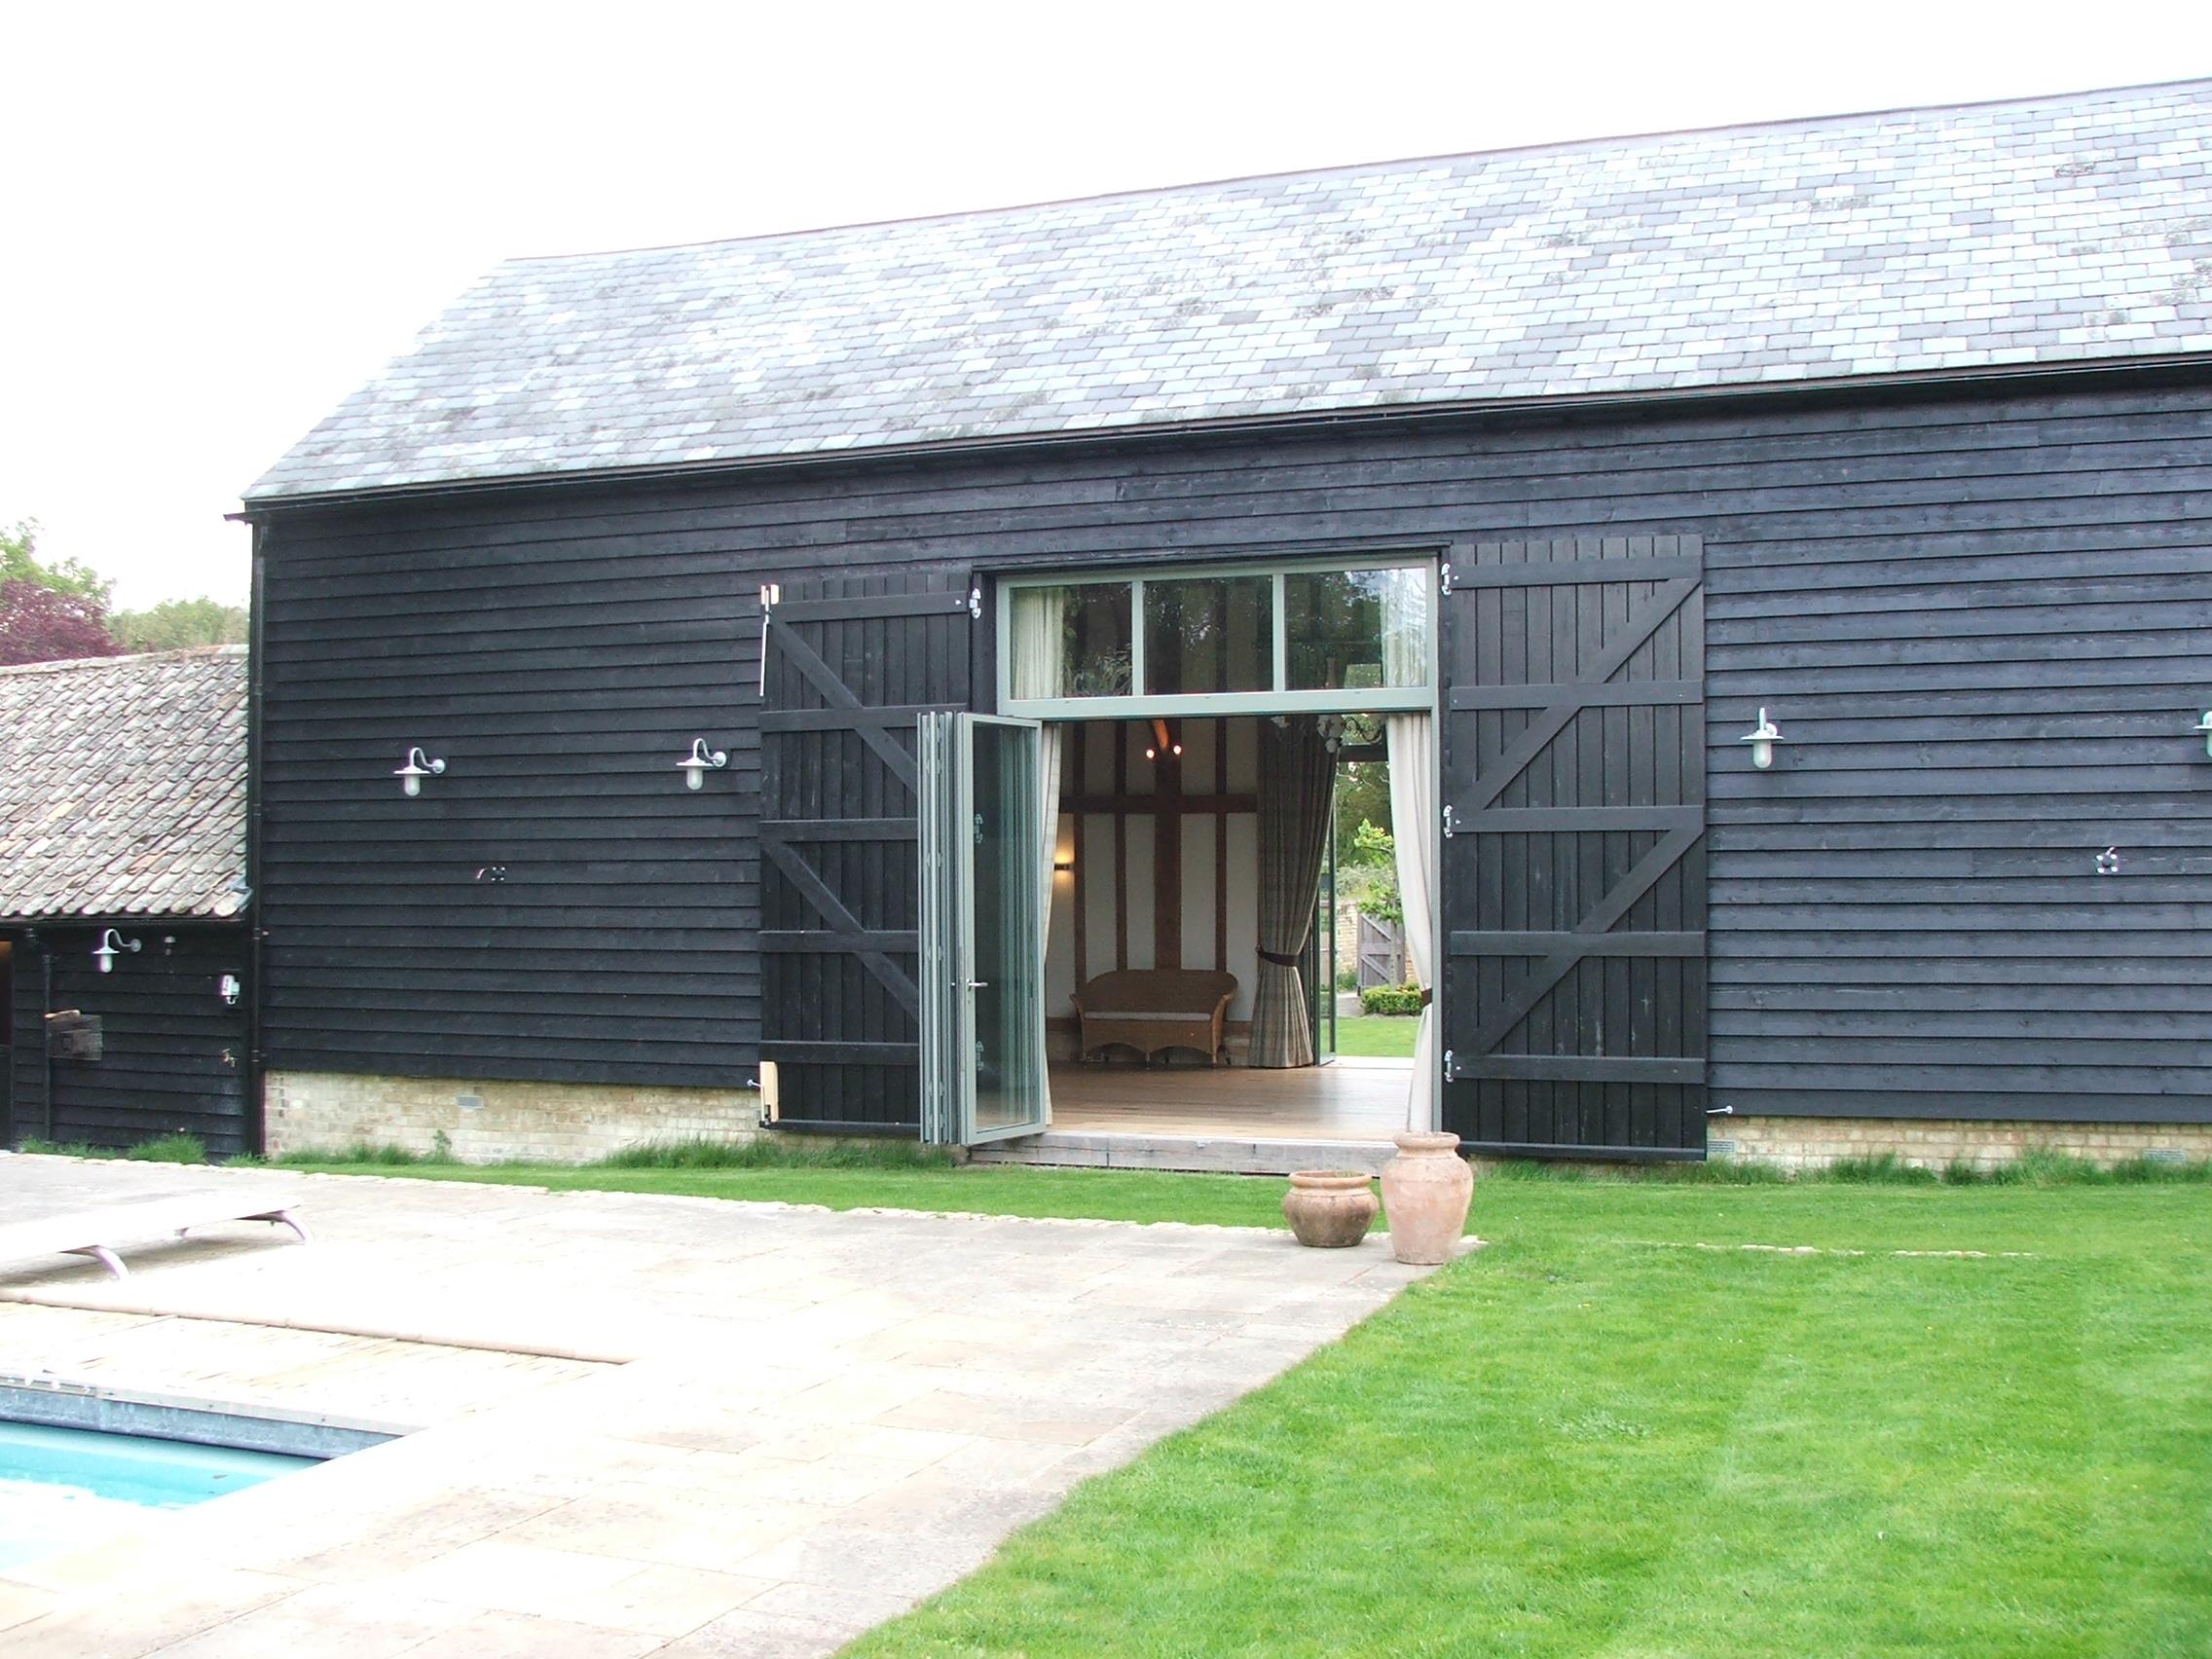 The Bury Barn